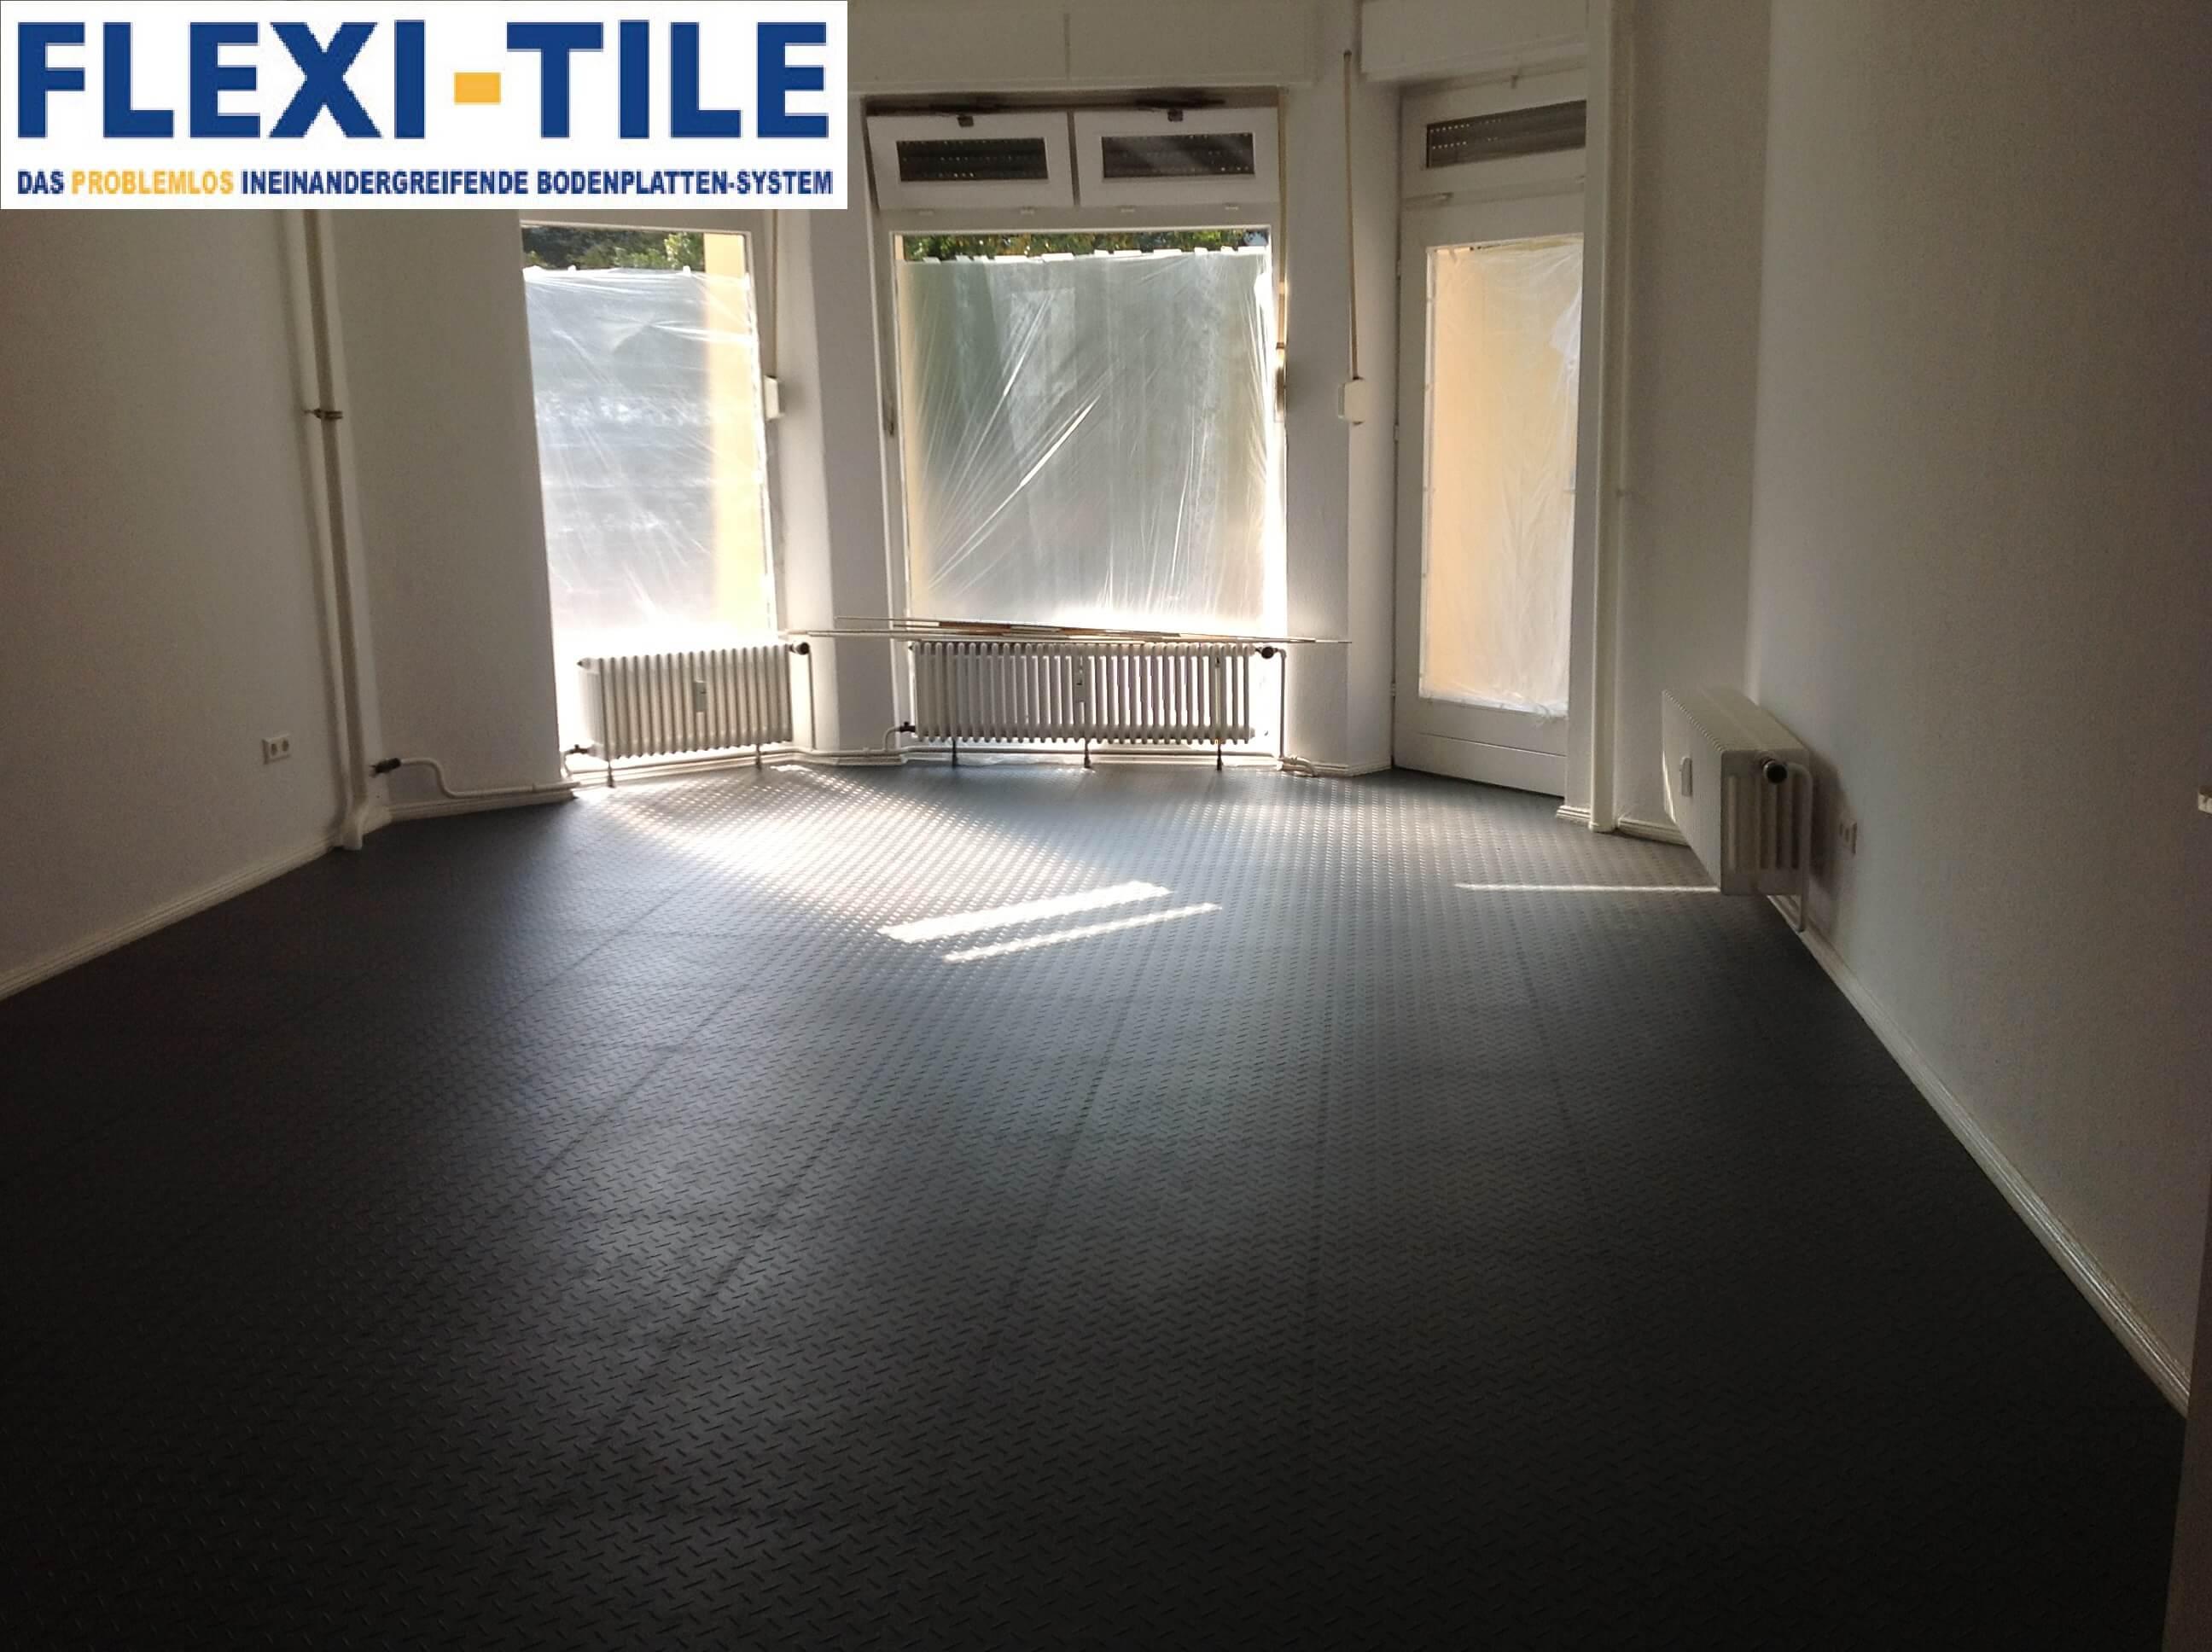 flexi tile pvc bodenfliesen als gewerbeboden. Black Bedroom Furniture Sets. Home Design Ideas